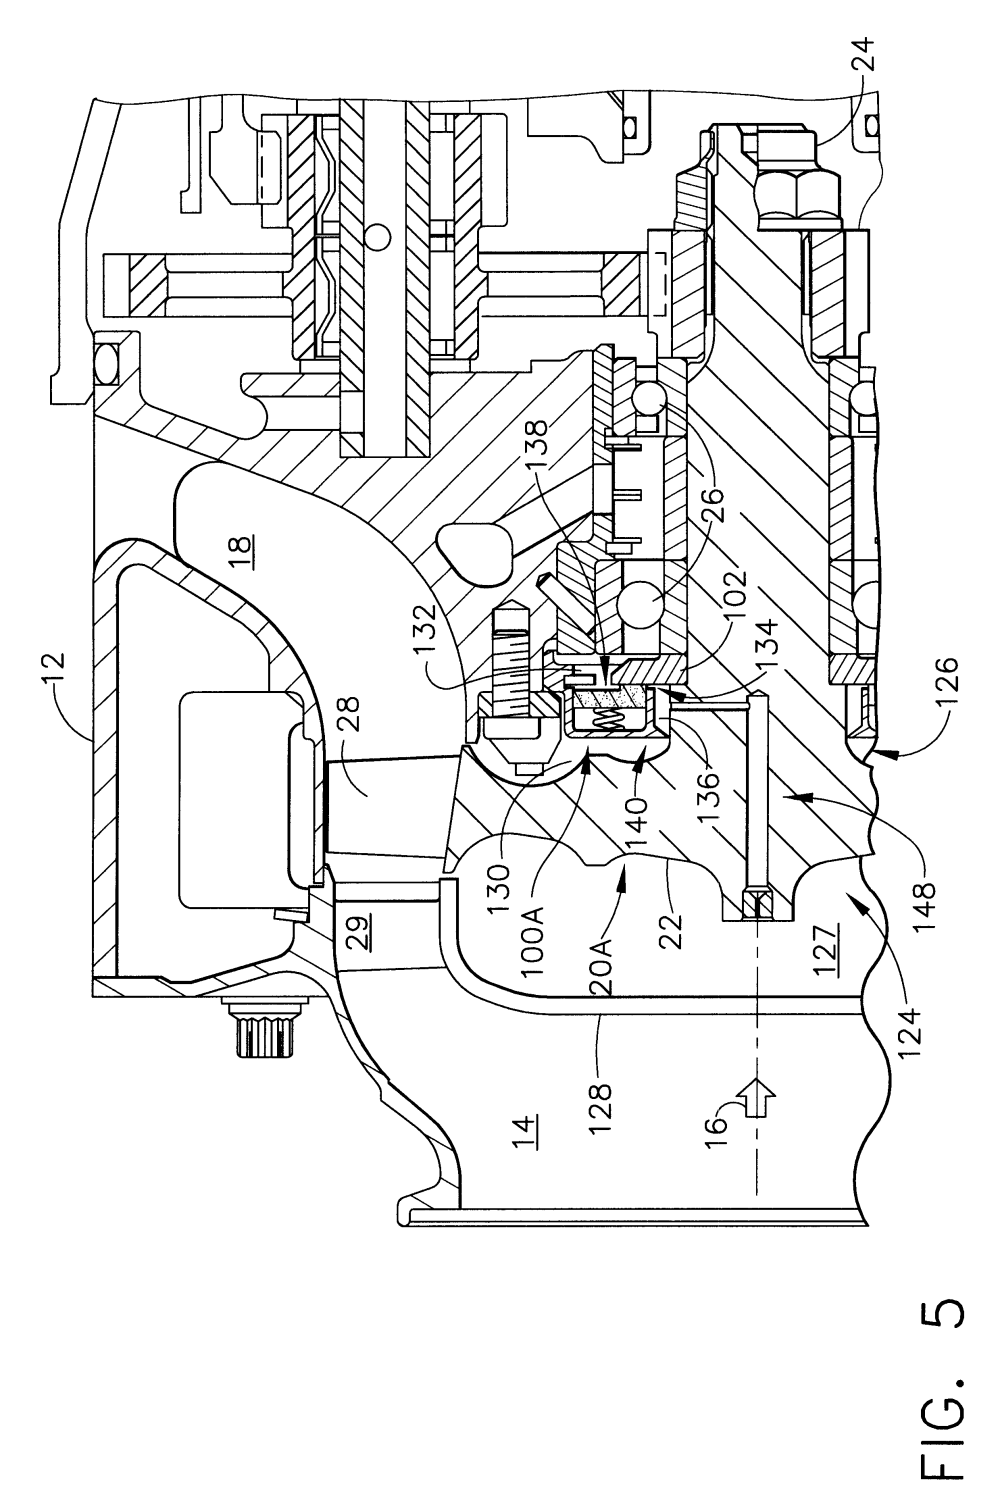 medium resolution of 4l80e wiring harness diagram diagrams schematics amazing chevy 4l60e transmission